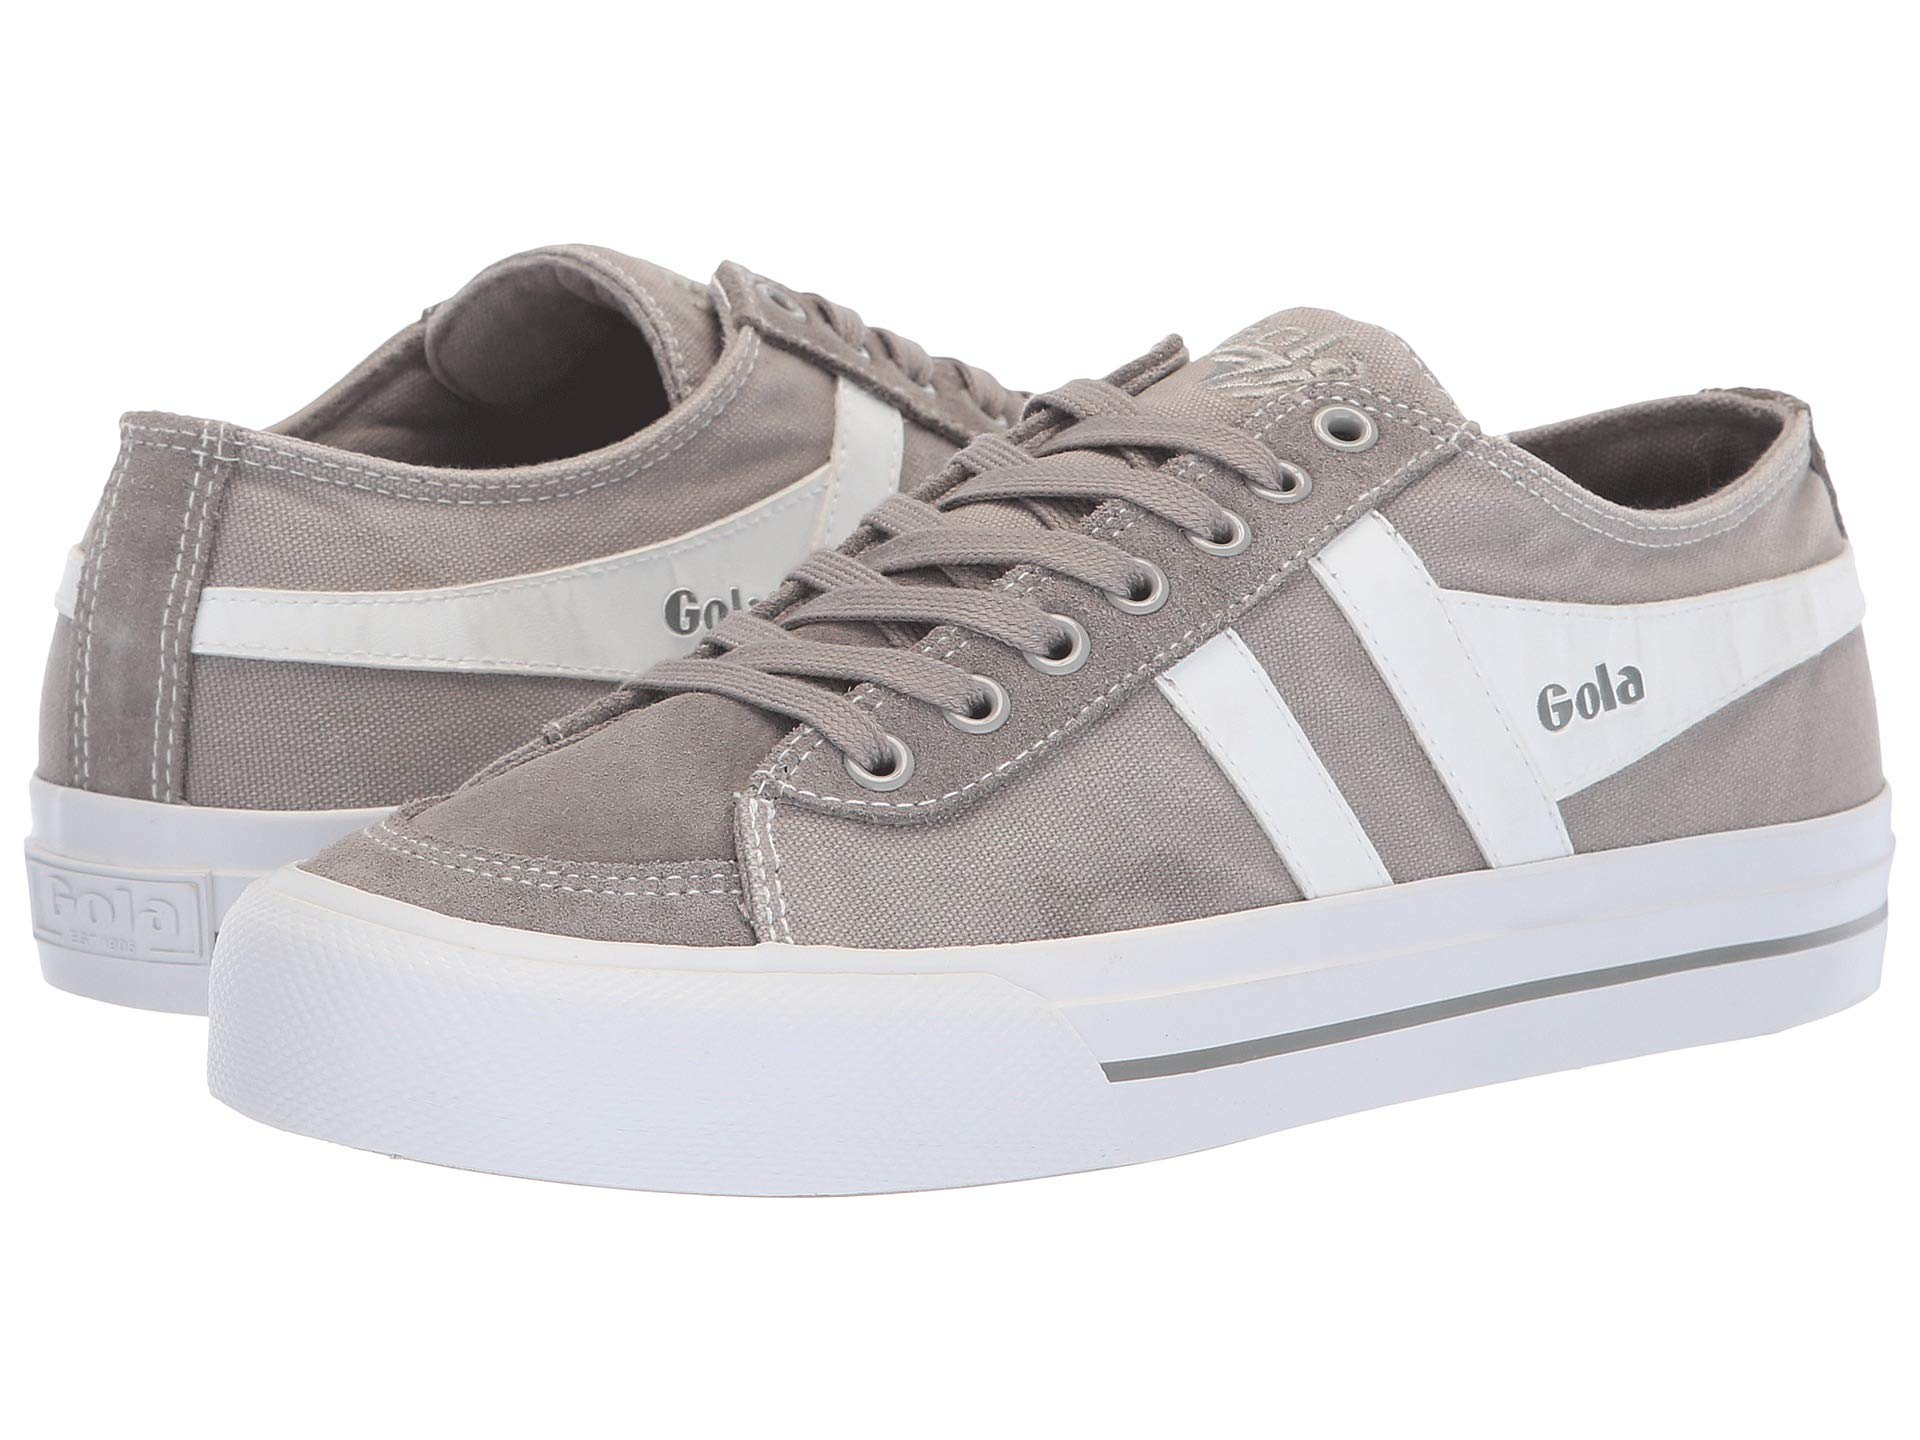 Gola Grey white Ii Light Quota vfqgrv